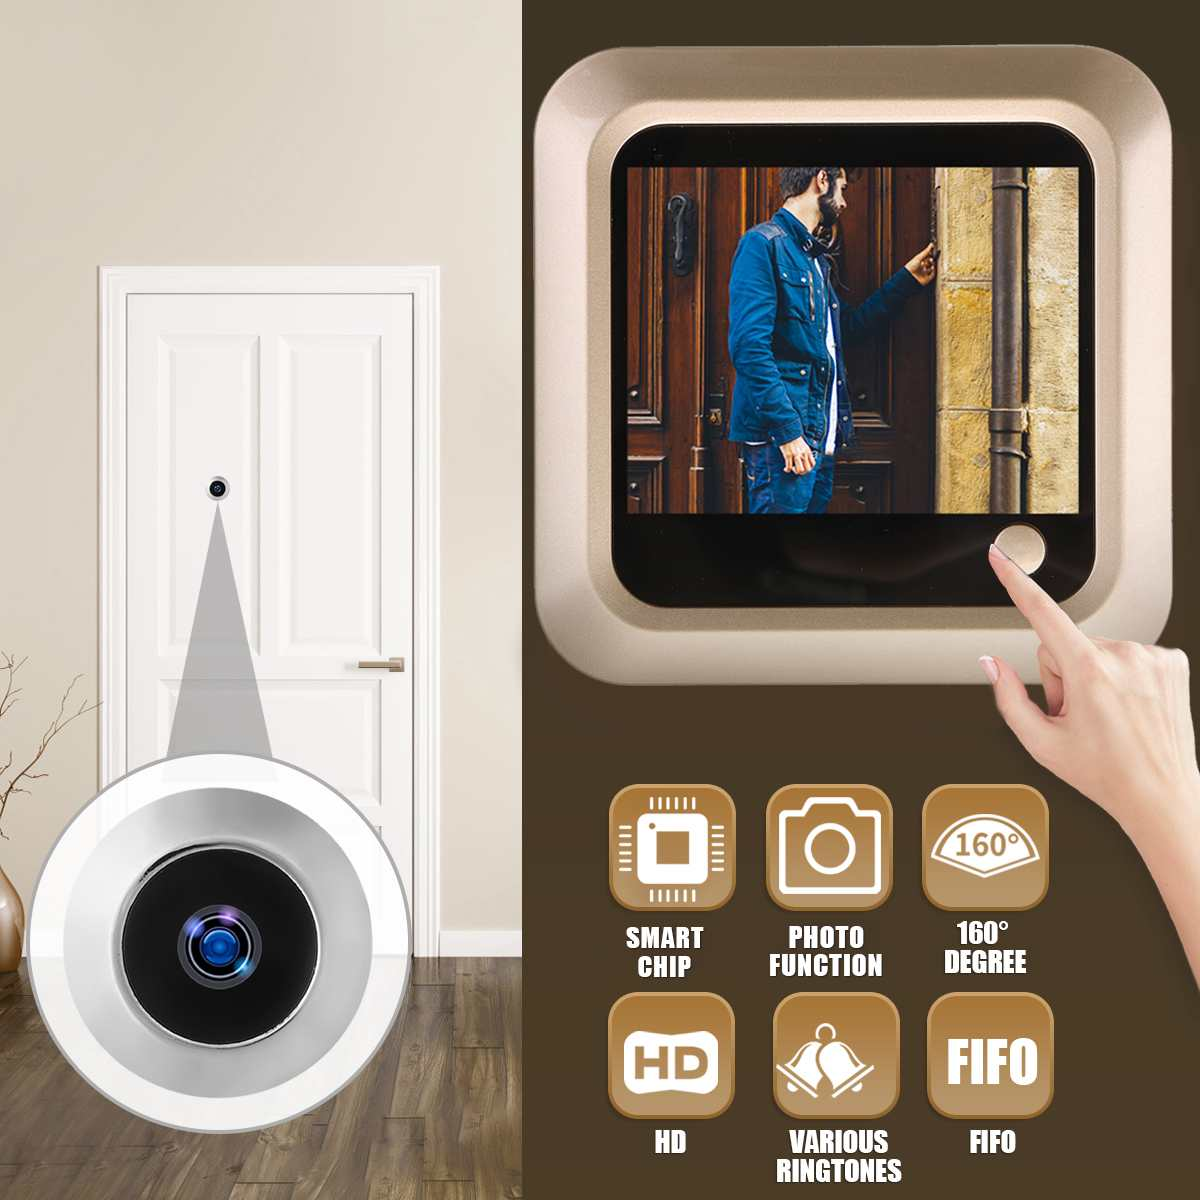 Digital LCD 2.4inch Video Doorbell Peephole Viewer Door Eye Monitoring Camera 160 Degree Smart Camera DoorbellDigital LCD 2.4inch Video Doorbell Peephole Viewer Door Eye Monitoring Camera 160 Degree Smart Camera Doorbell